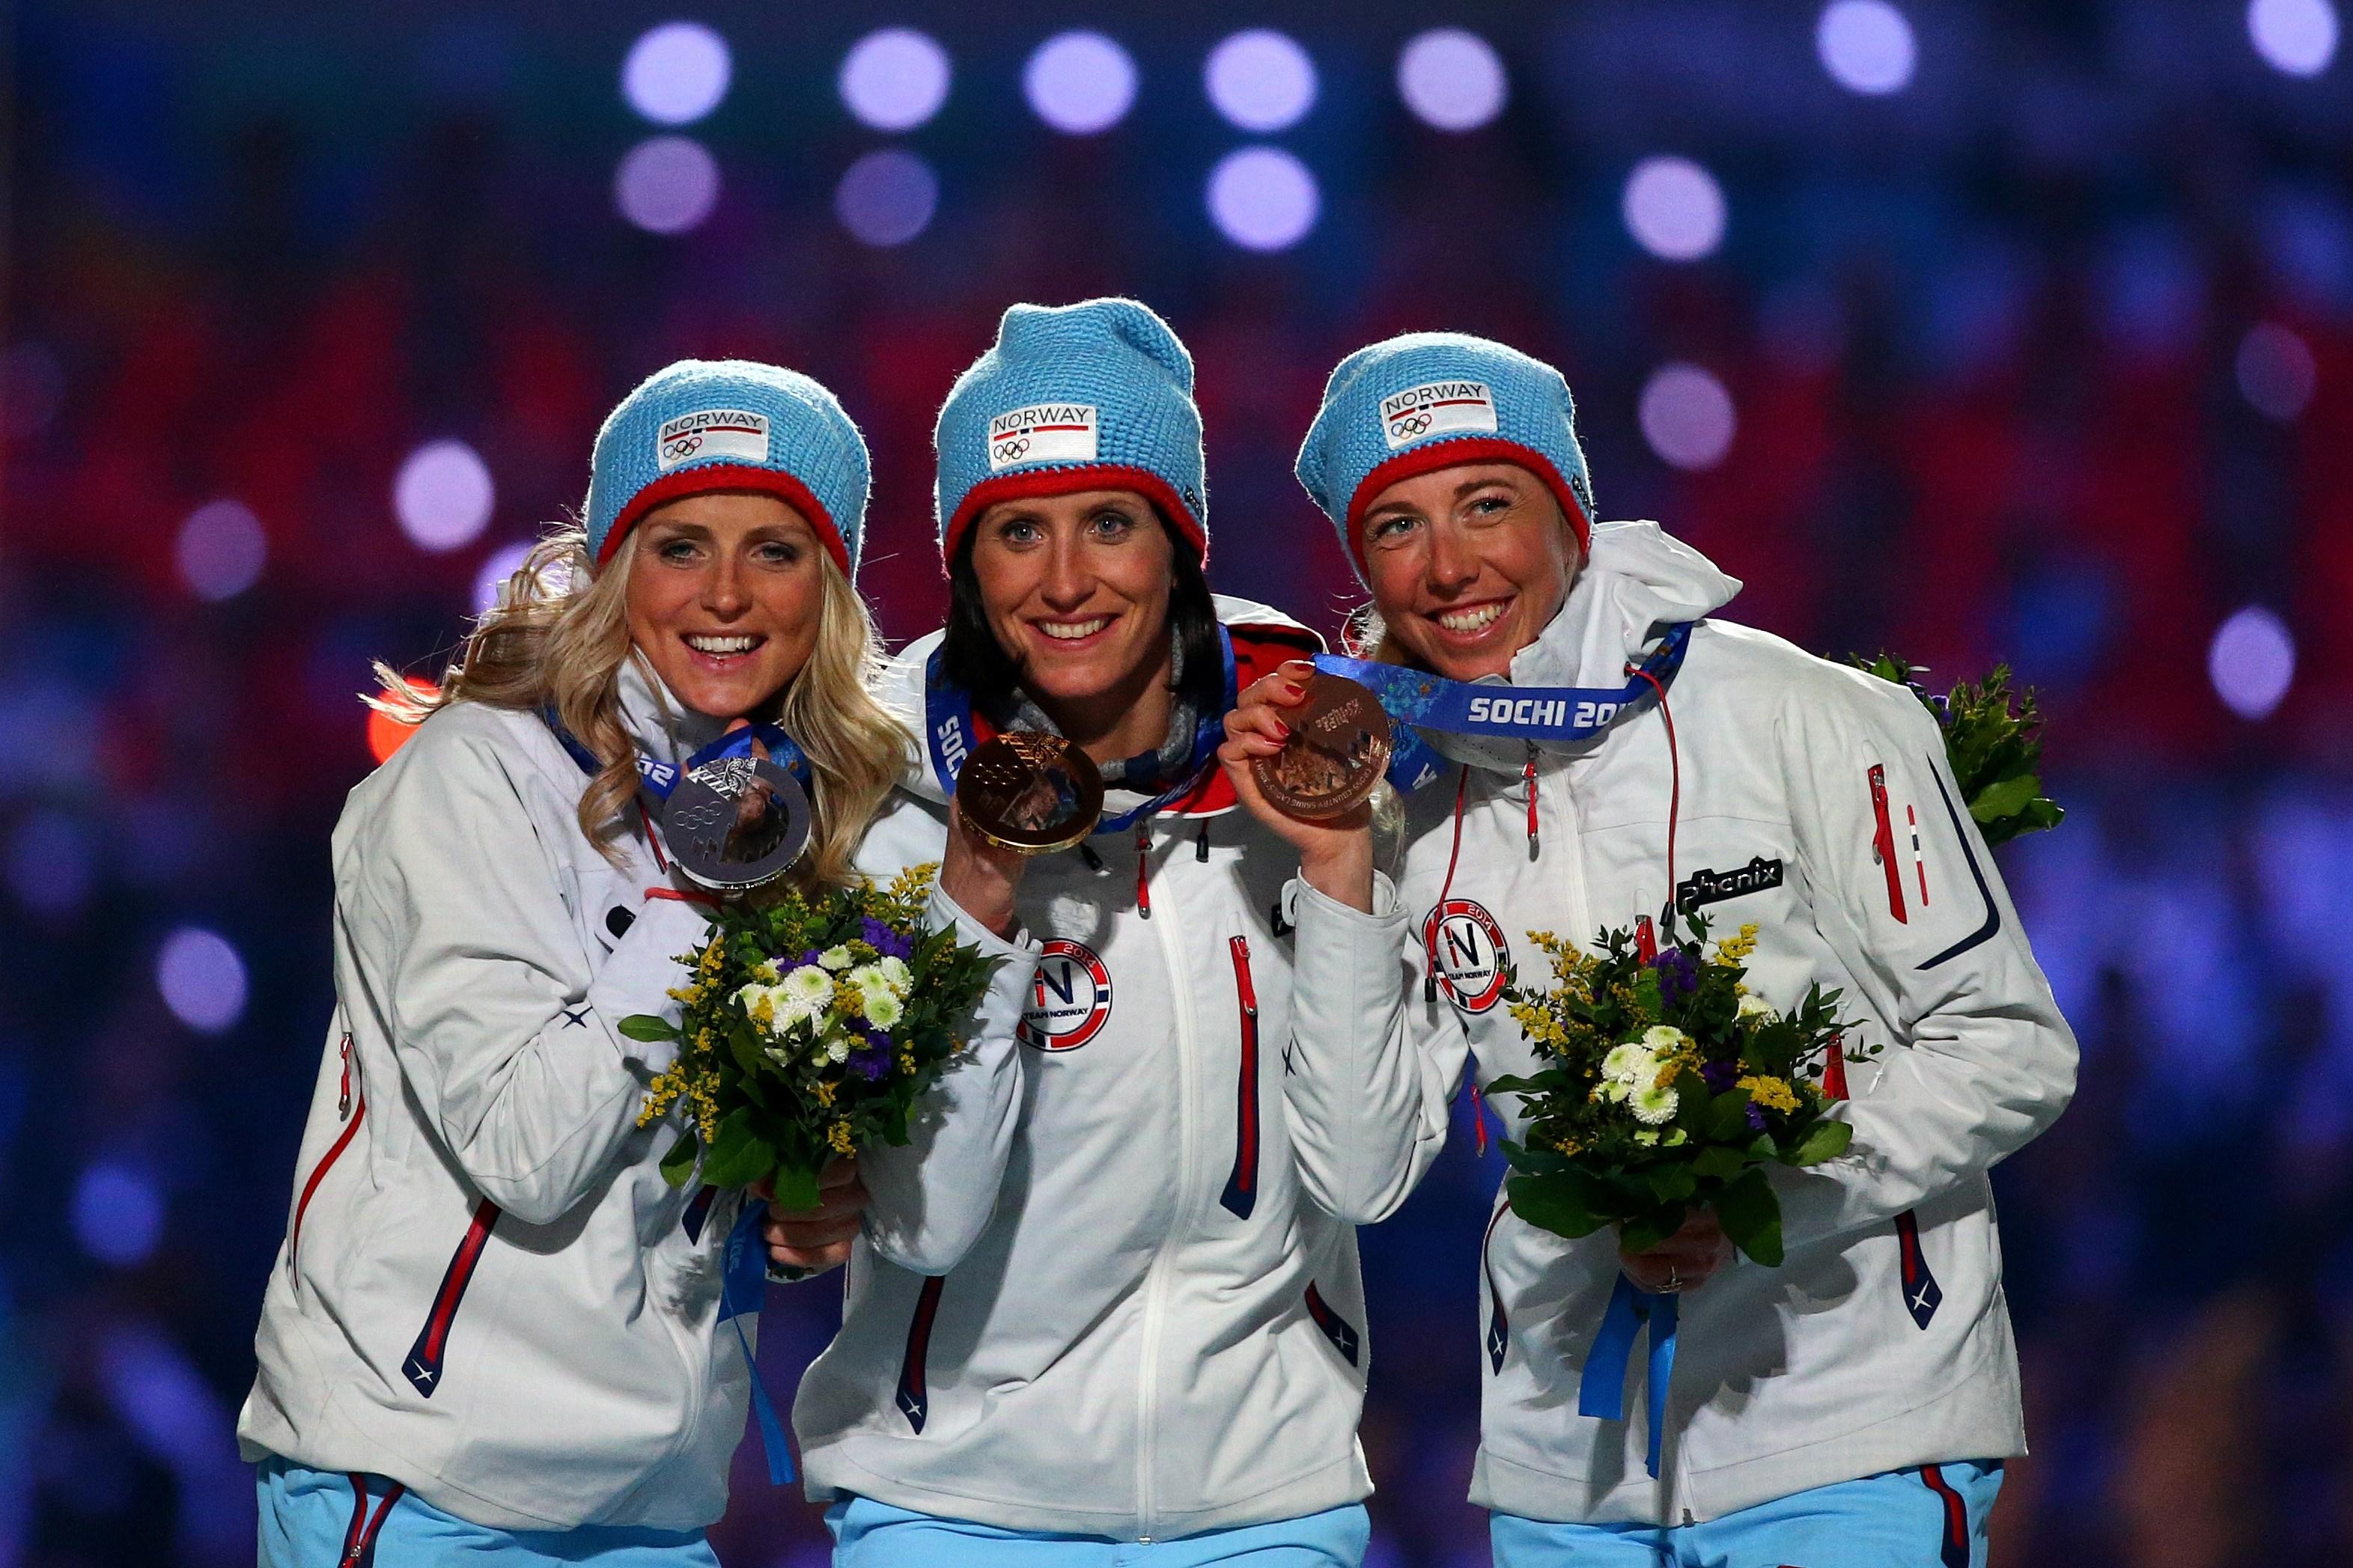 лучшие картинки олимпиады носит прада